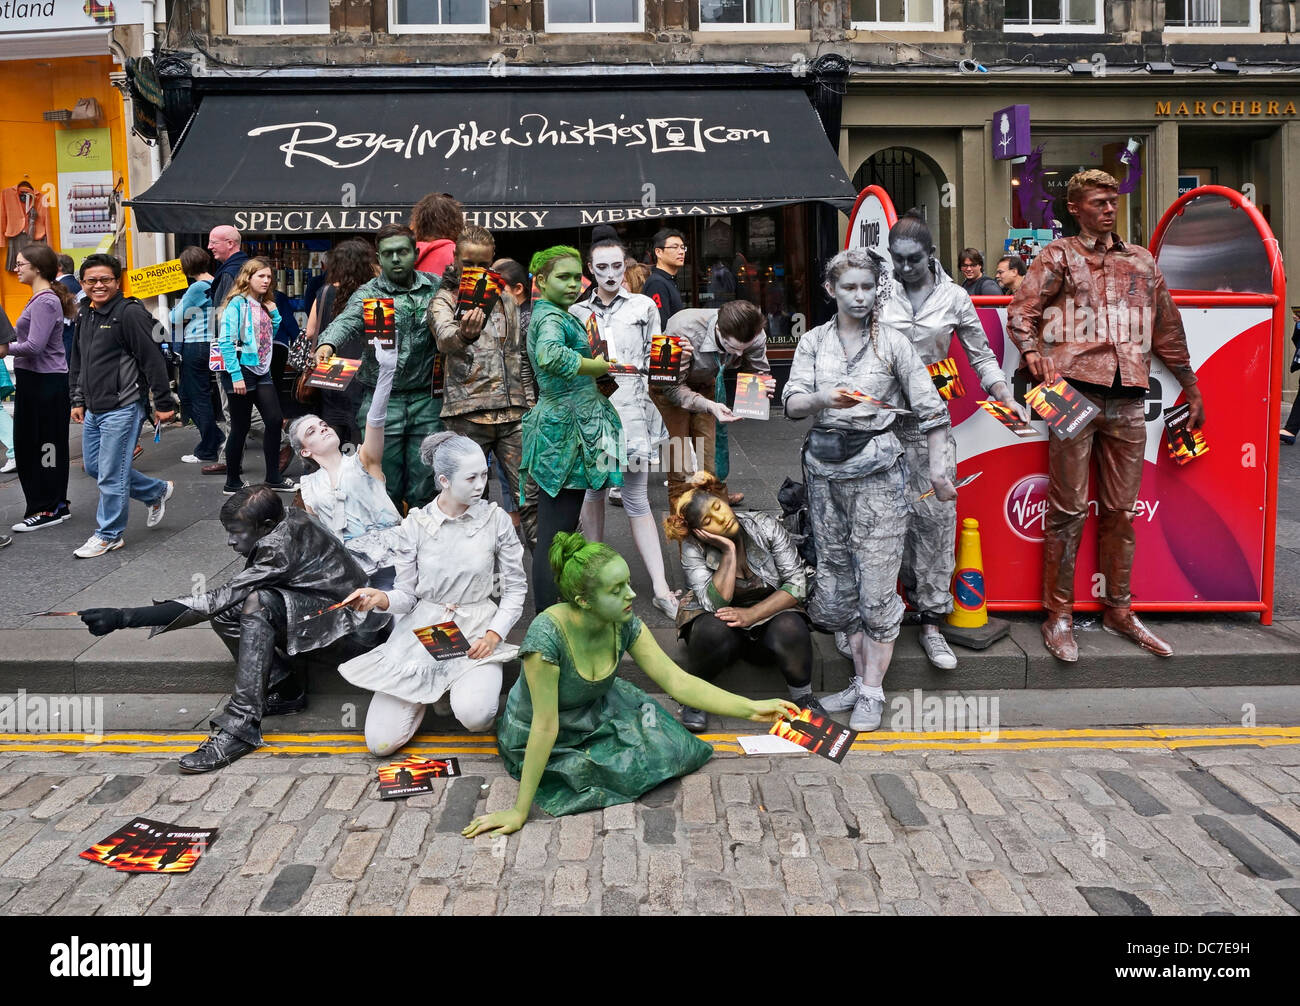 Fringe performers promoting Sentinels show in The Royal Mile Edinburgh during the 2013 Edinburgh Festival Fringe - Stock Image